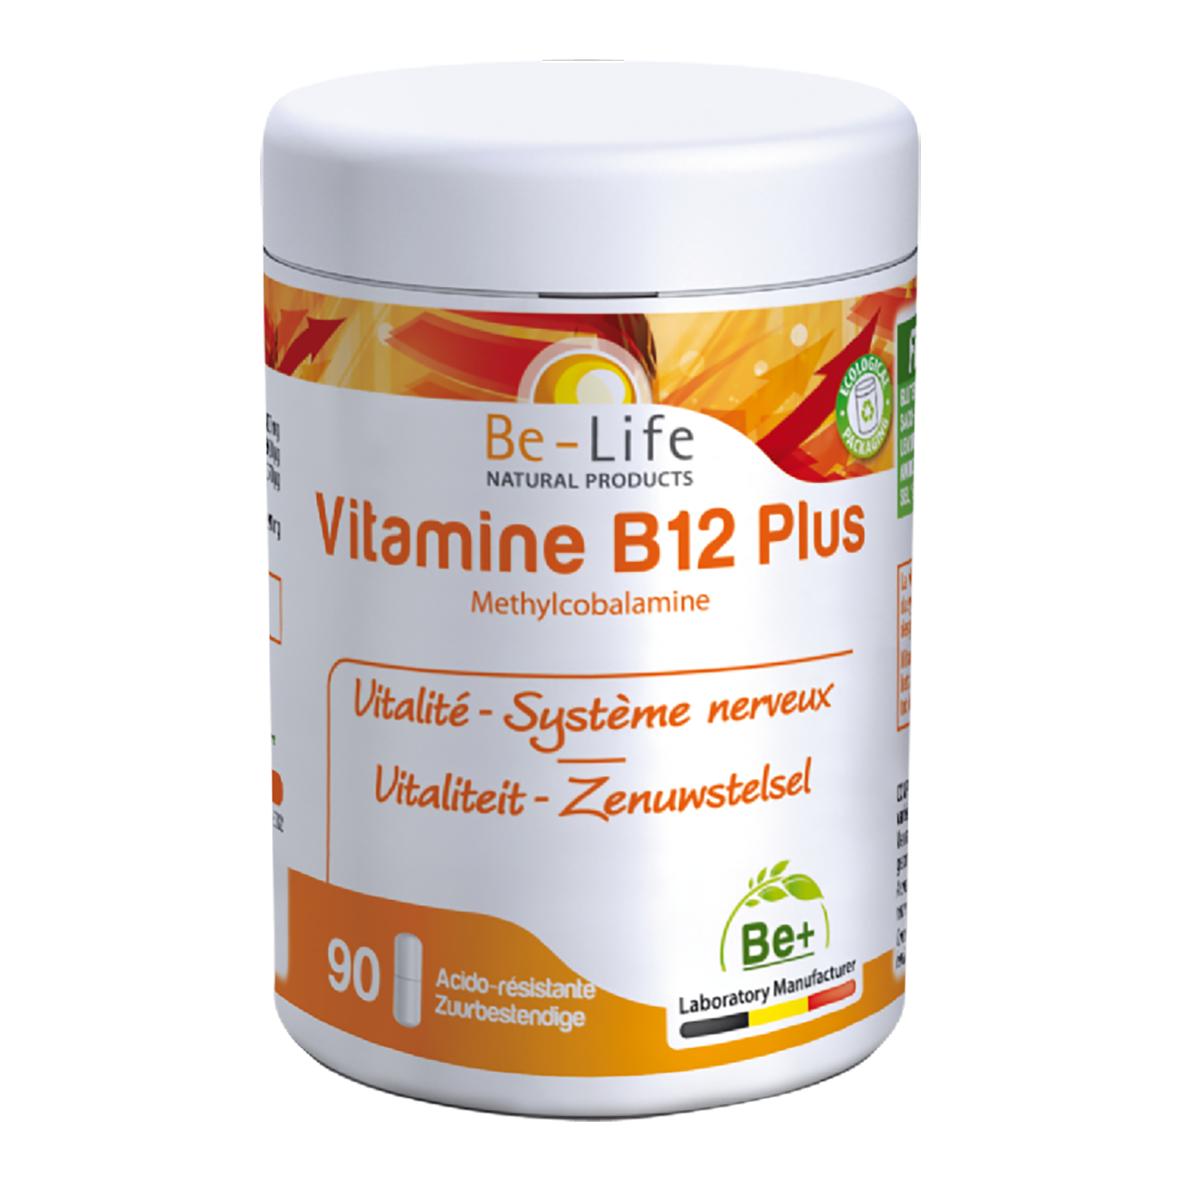 Lechoppebio Vitamines B12 PLUS 90 gélules - Belife